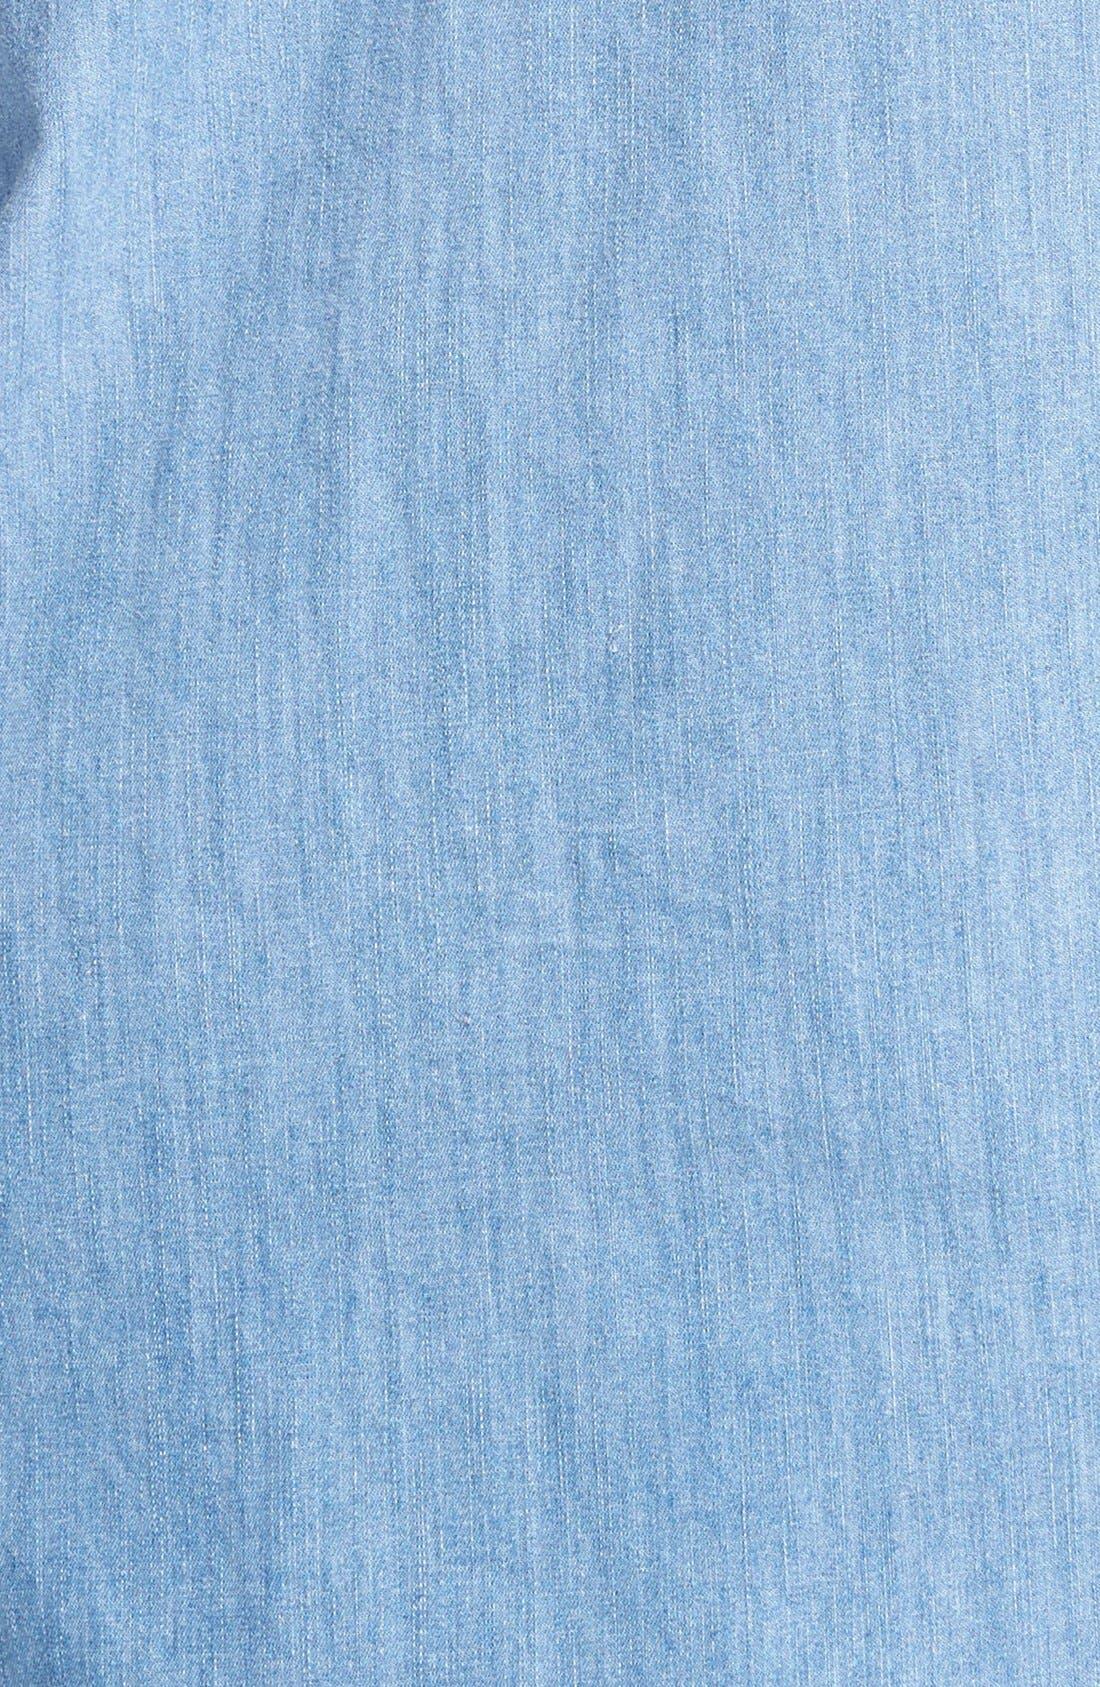 Alternate Image 3  - Current/Elliott 'The Perfect Shirt' Denim Shirtdress